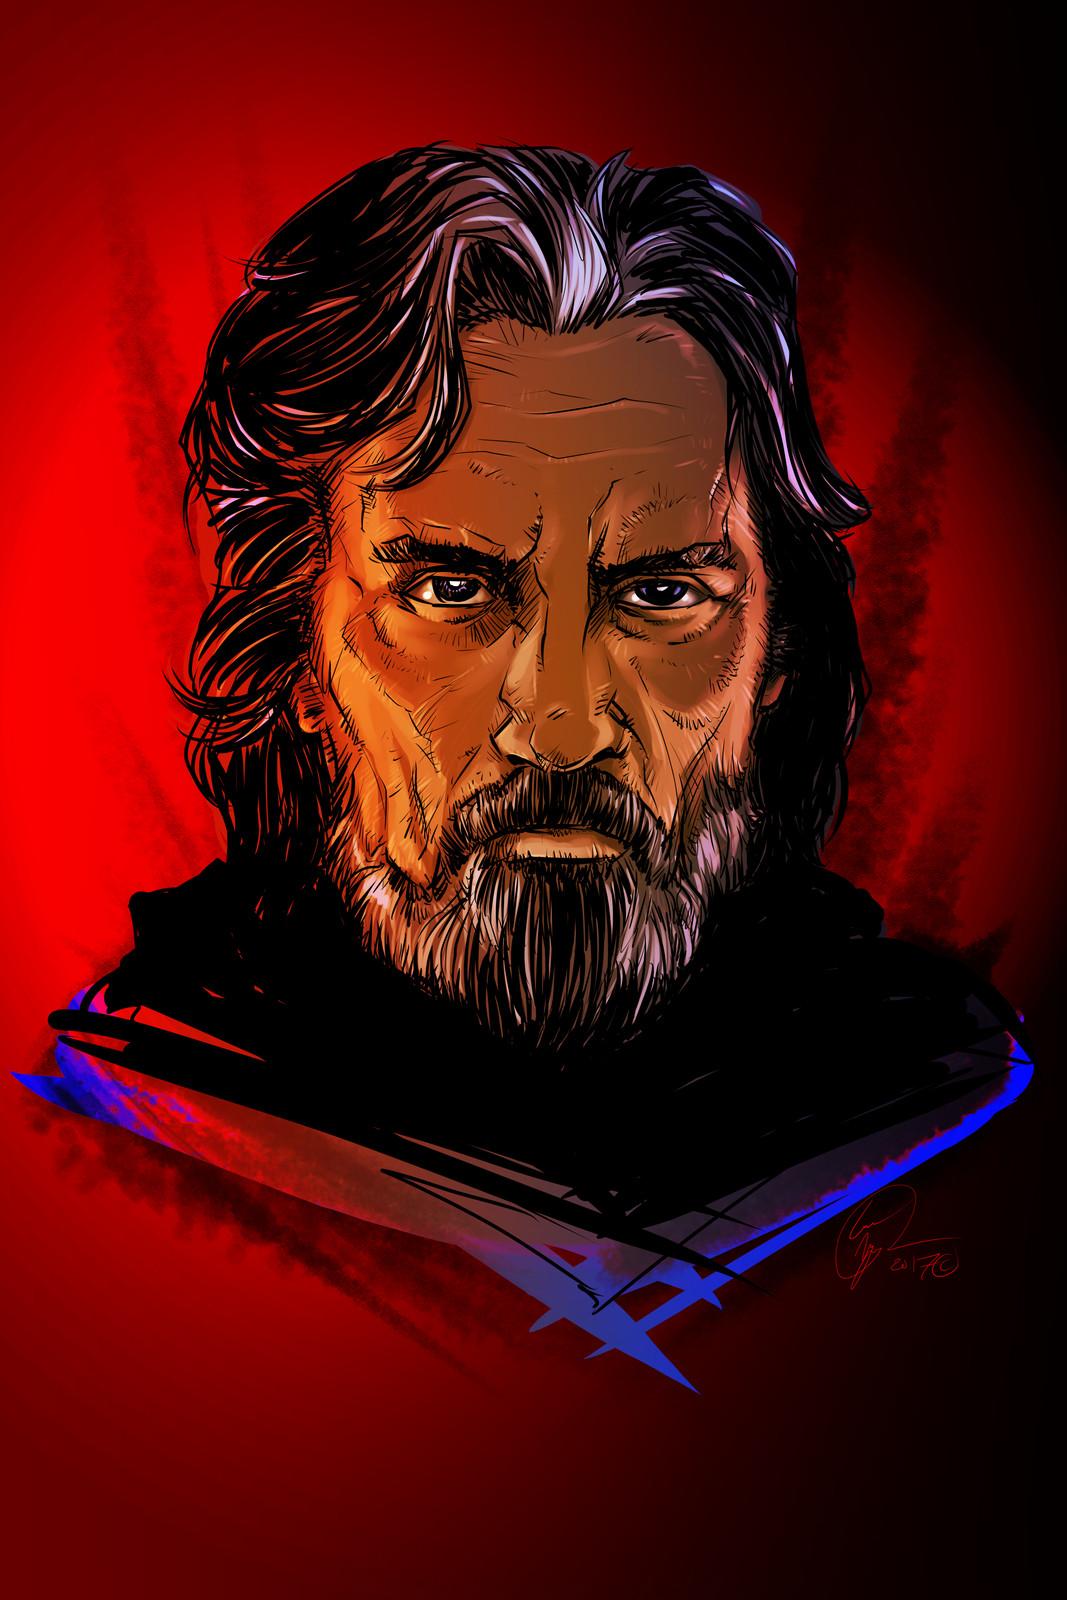 Luke, Last Jedi